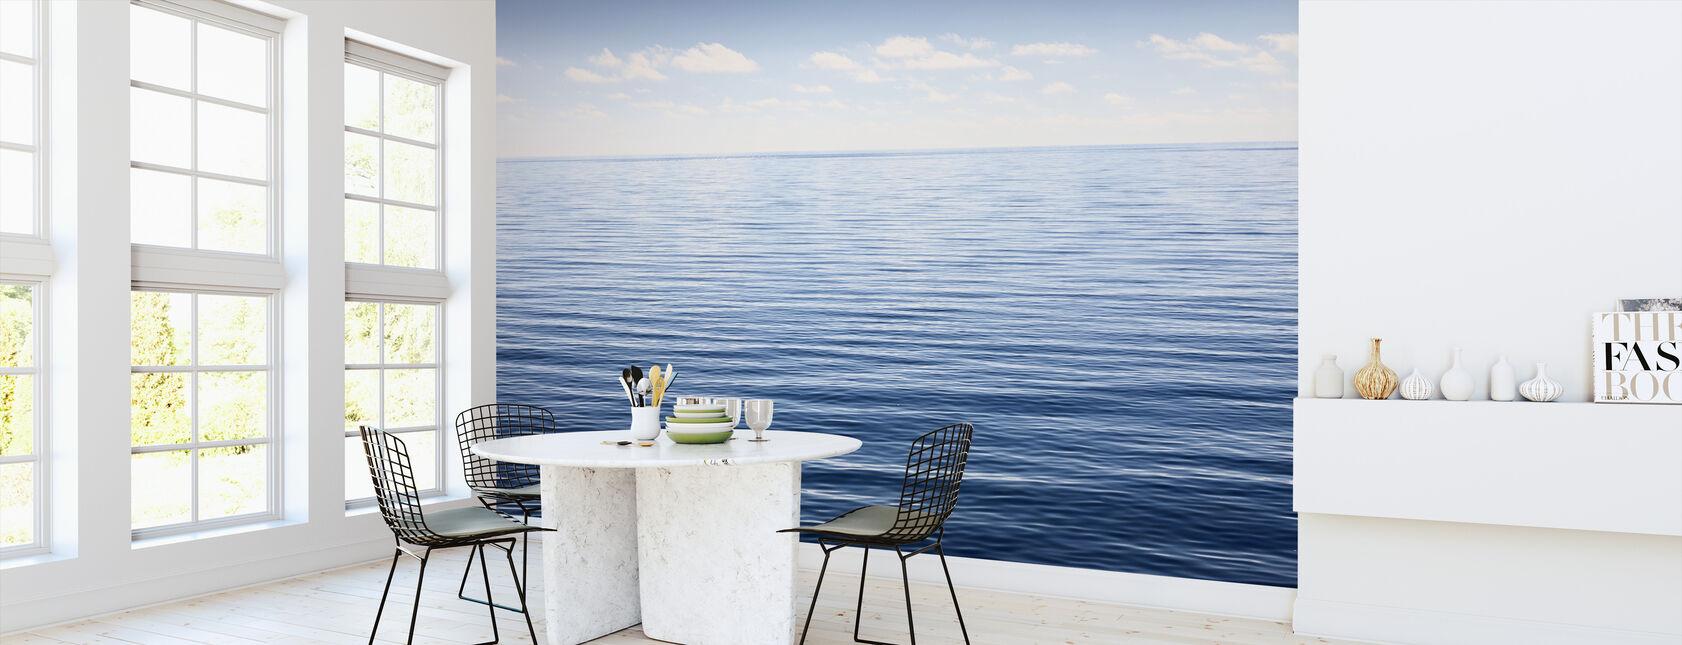 Endloses Meer - Tapete - Küchen